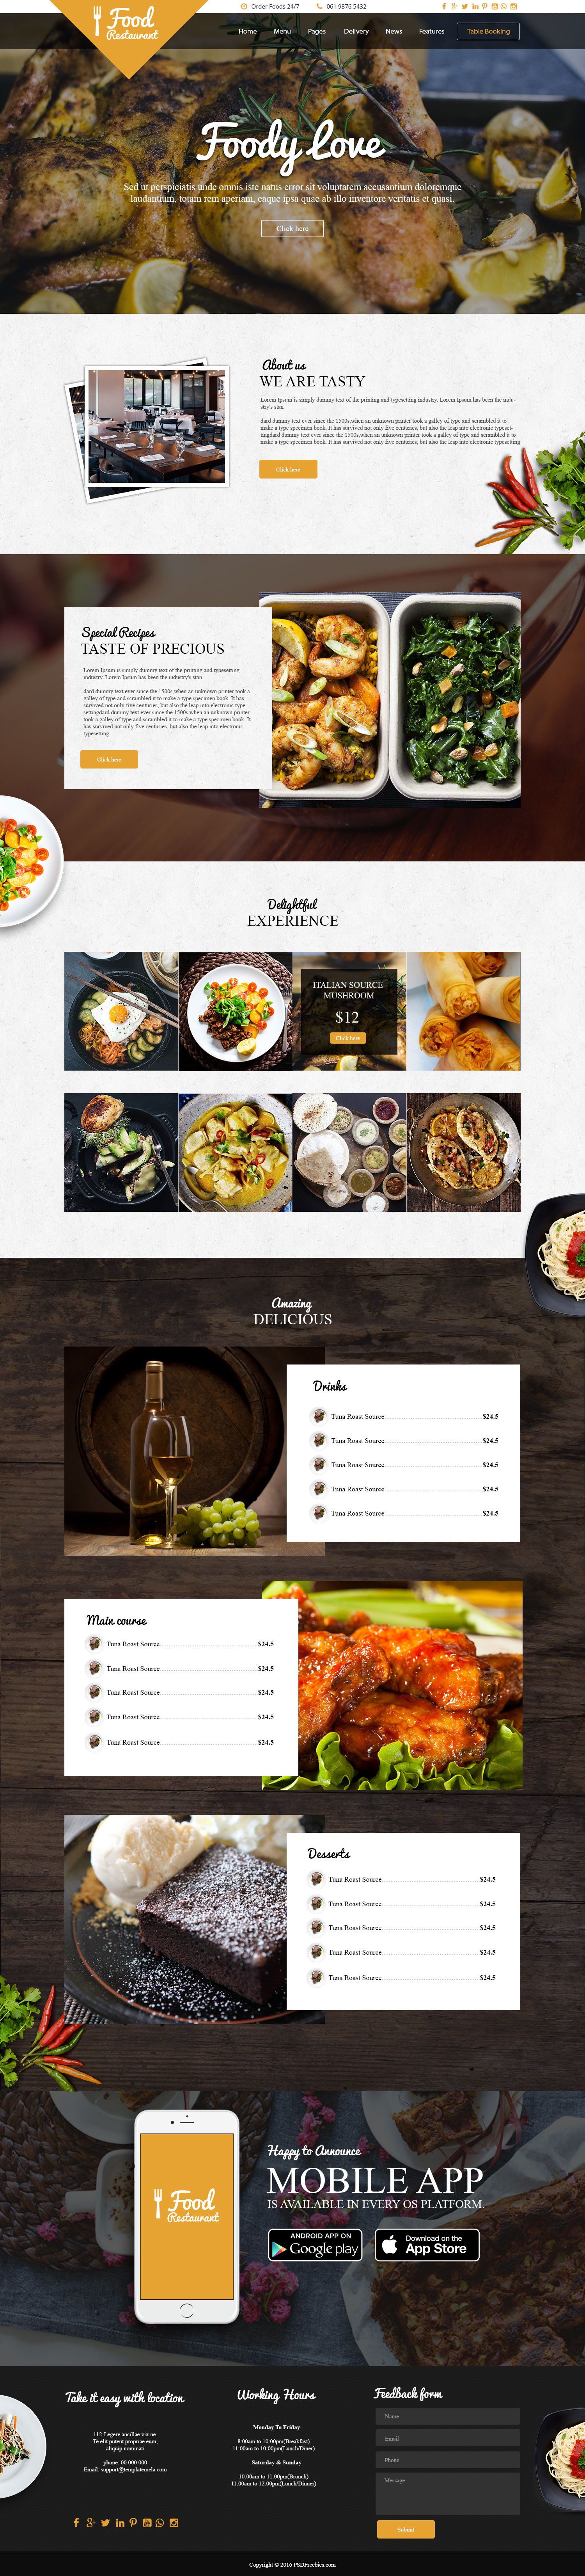 Food and Restaurant Free PSD Template | Design | Pinterest | Psd ...